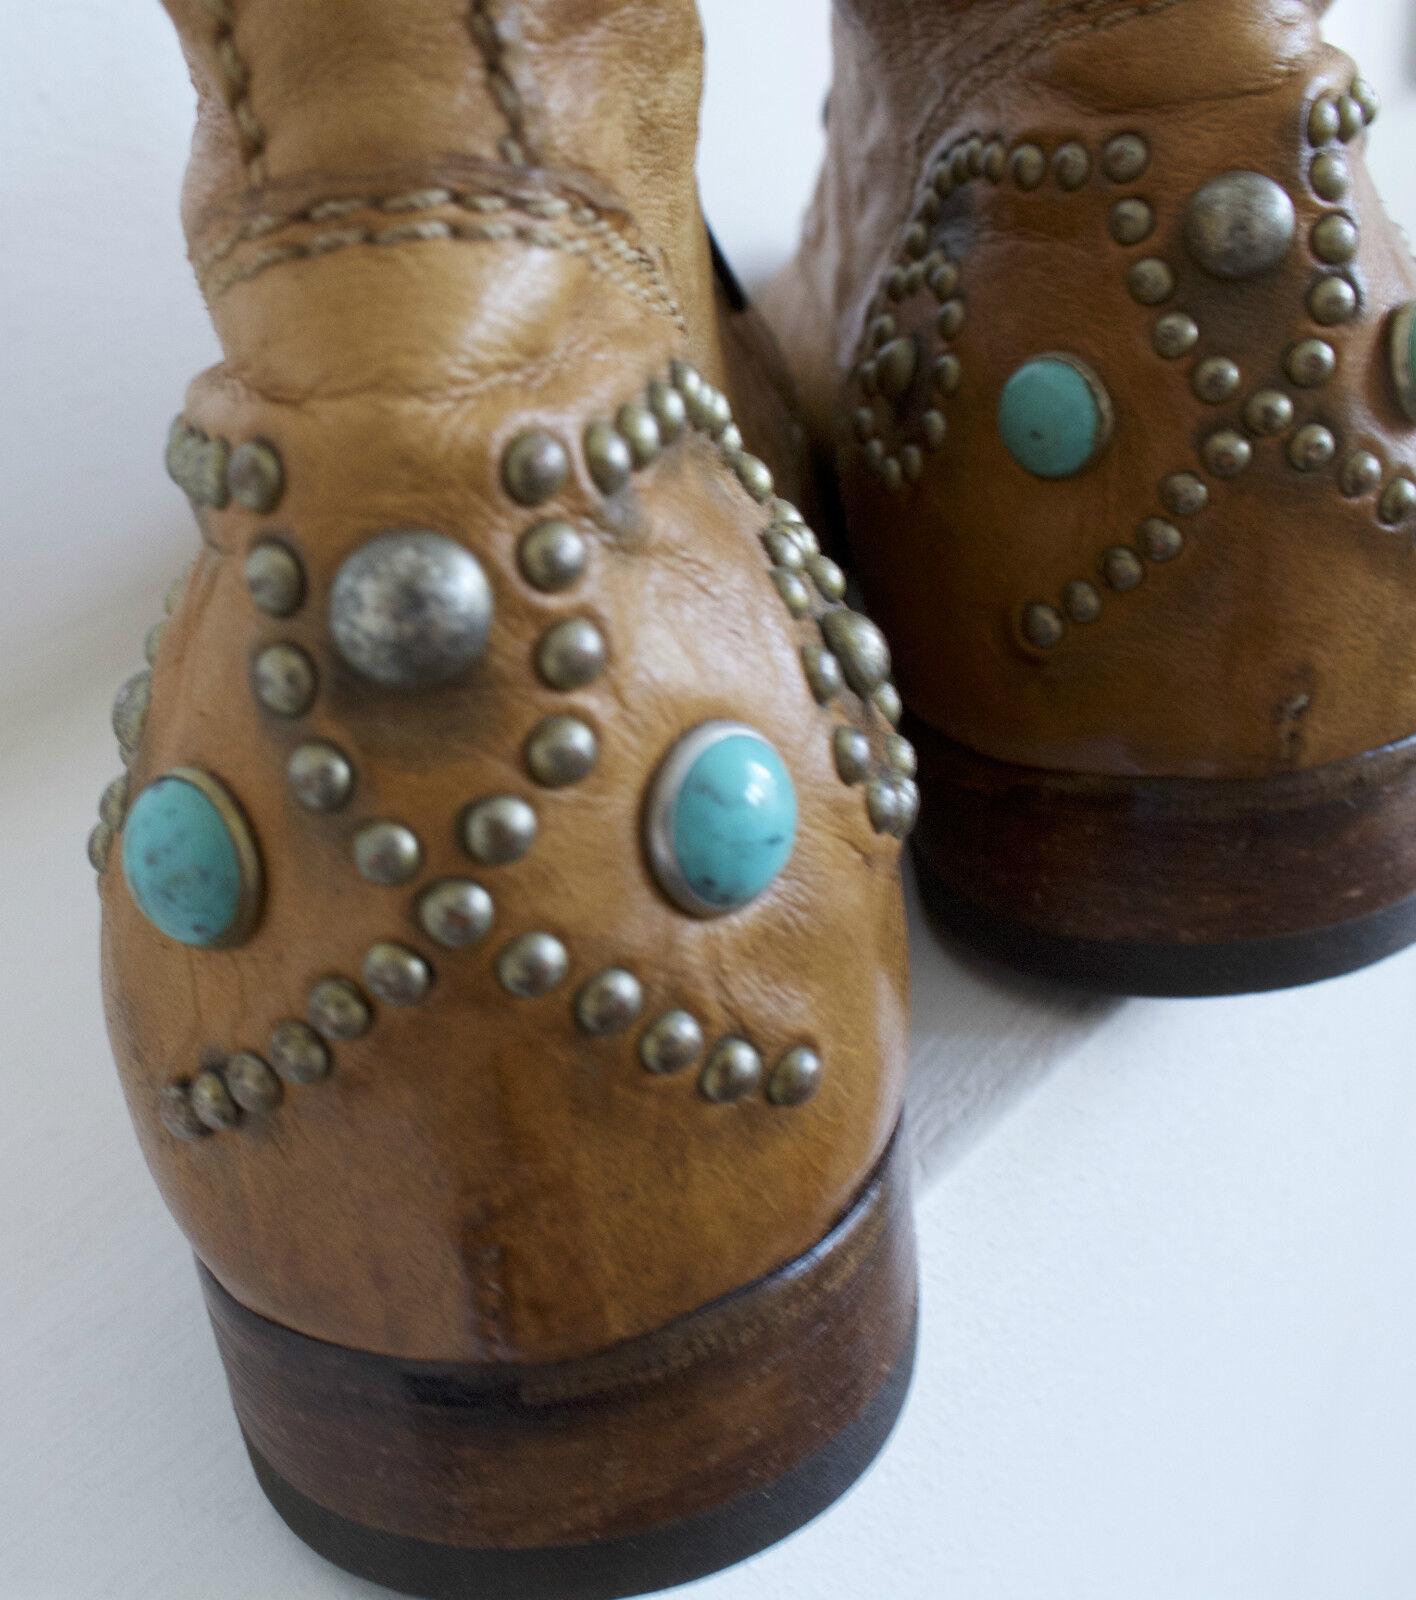 PRIMABASE Schnür-Boots Stiefeletten Leder handgenäht 39 Ethno Boho Festival Gr. 39 handgenäht 2abfb2